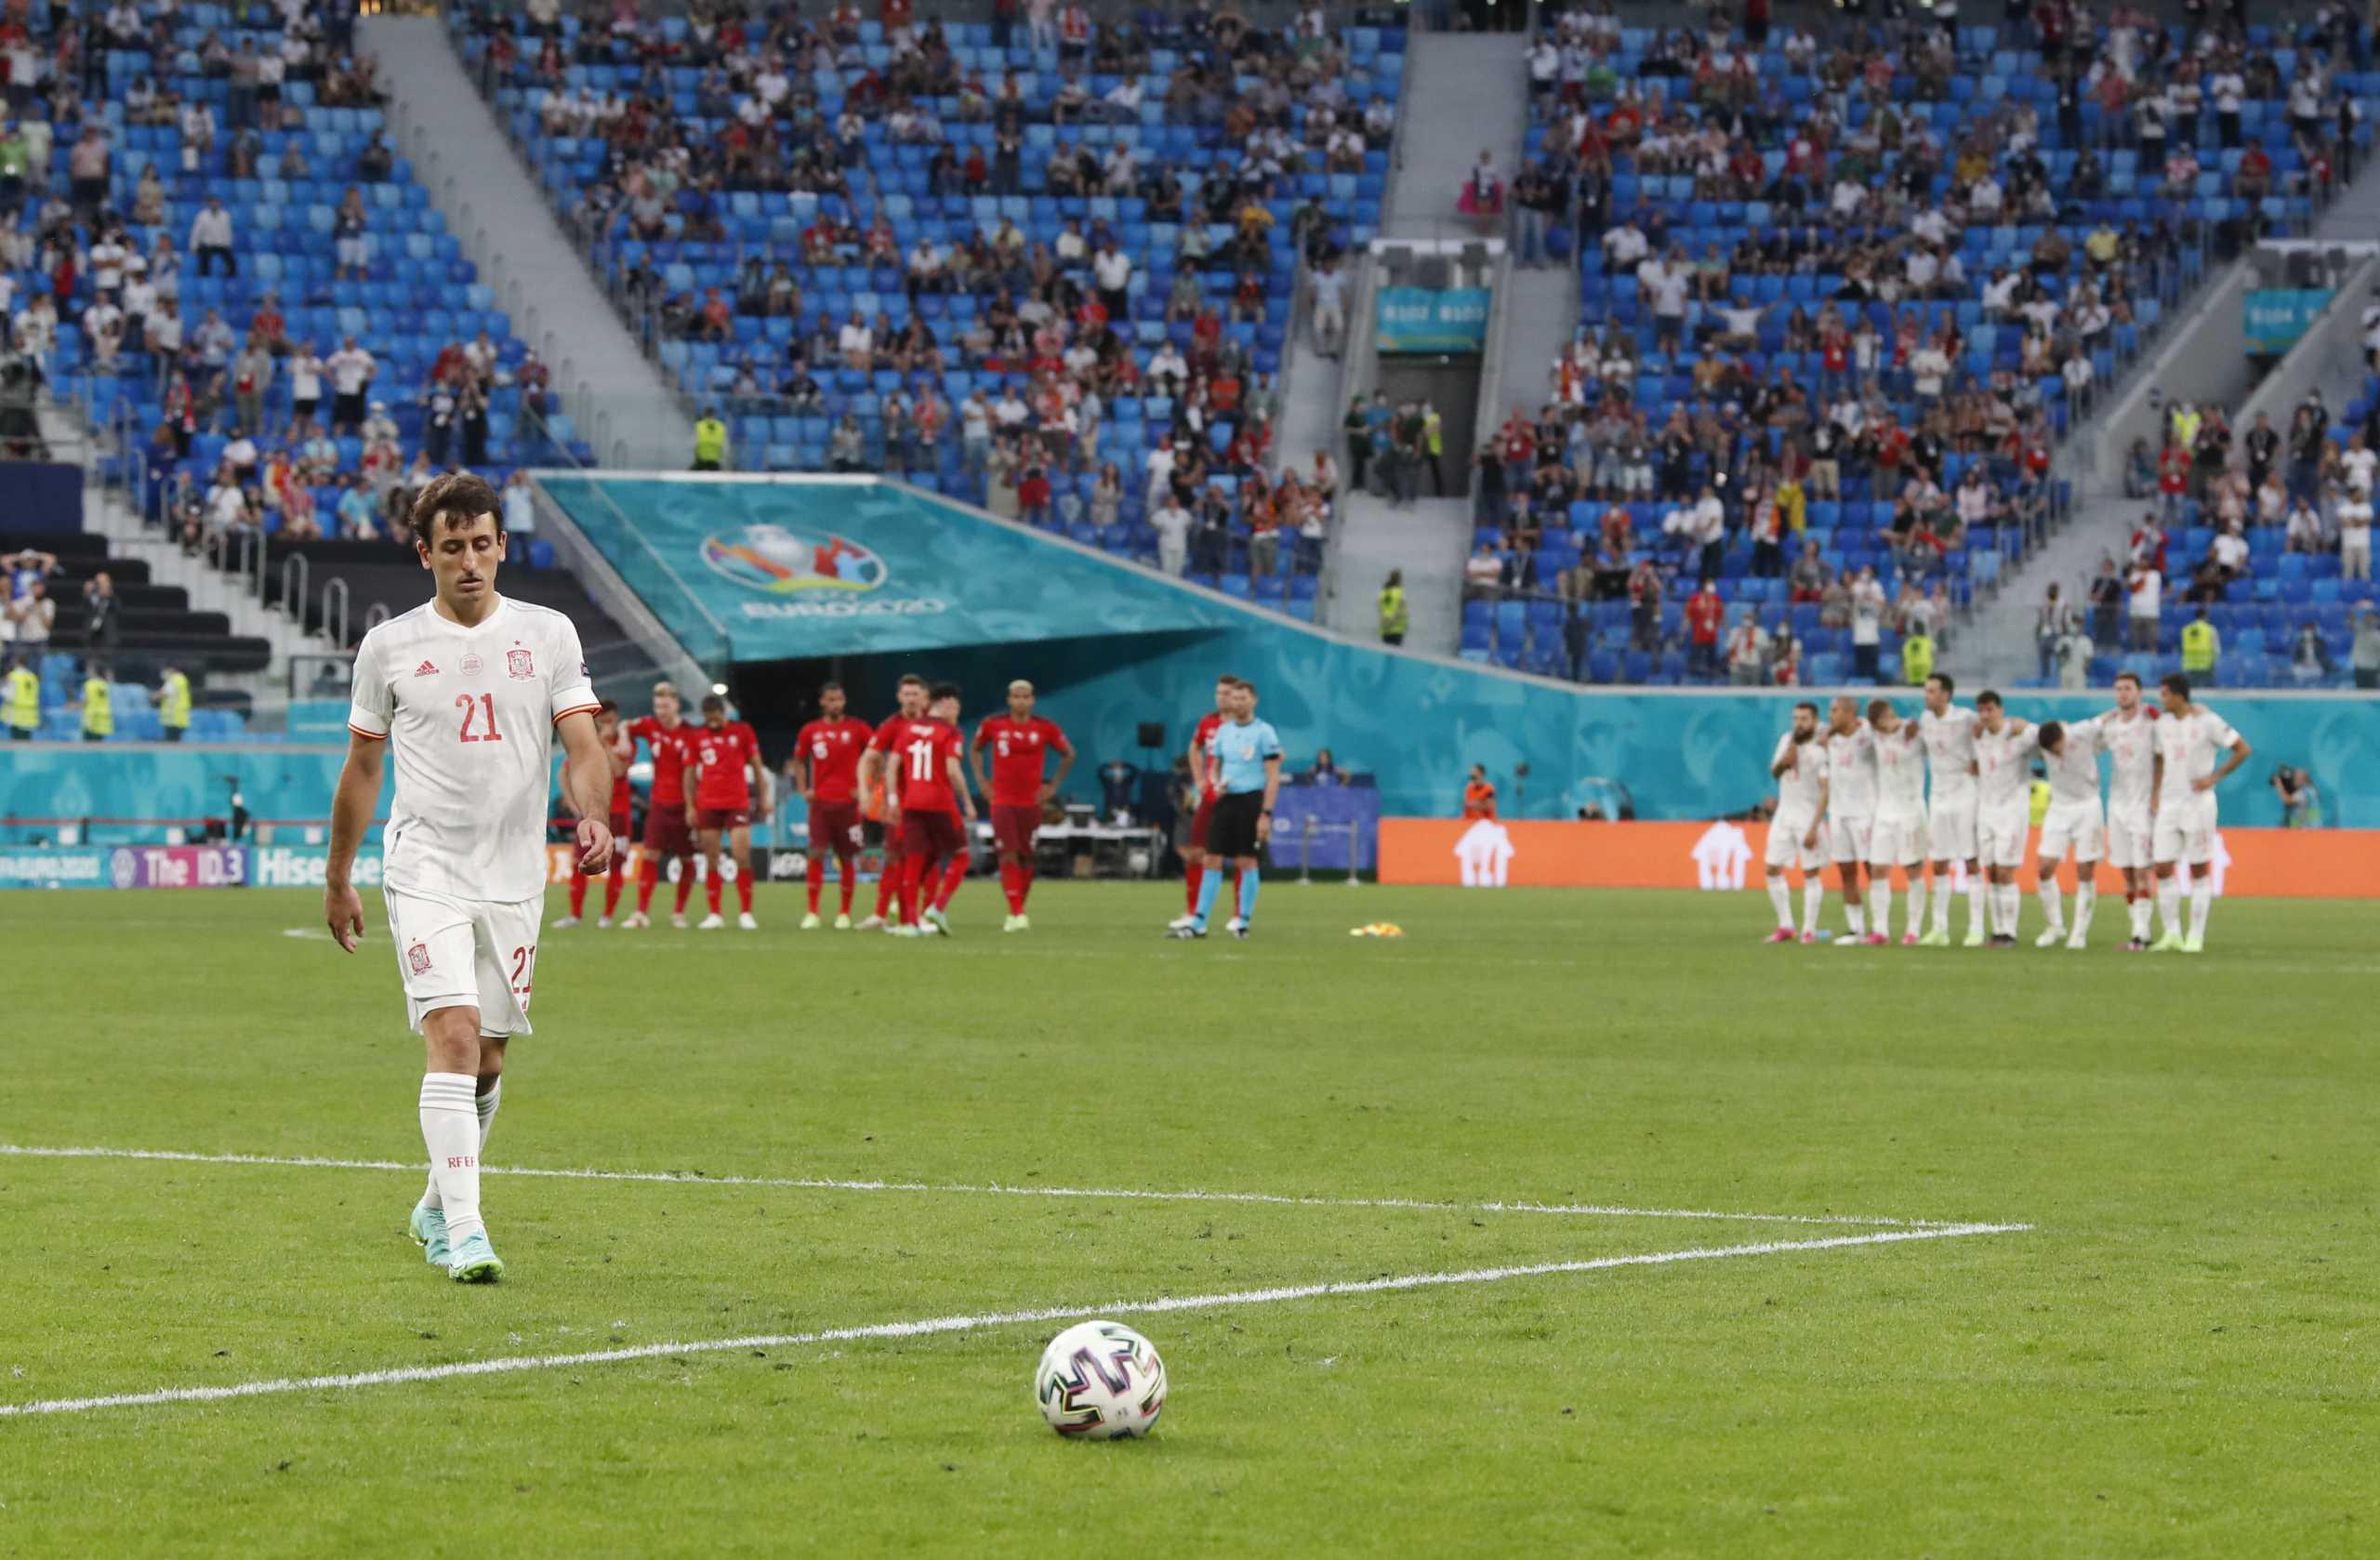 Euro 2020: Δέκα εκατομμύρια Ισπανοί είδαν το πέναλτι του Ογιαρθάμπαλ